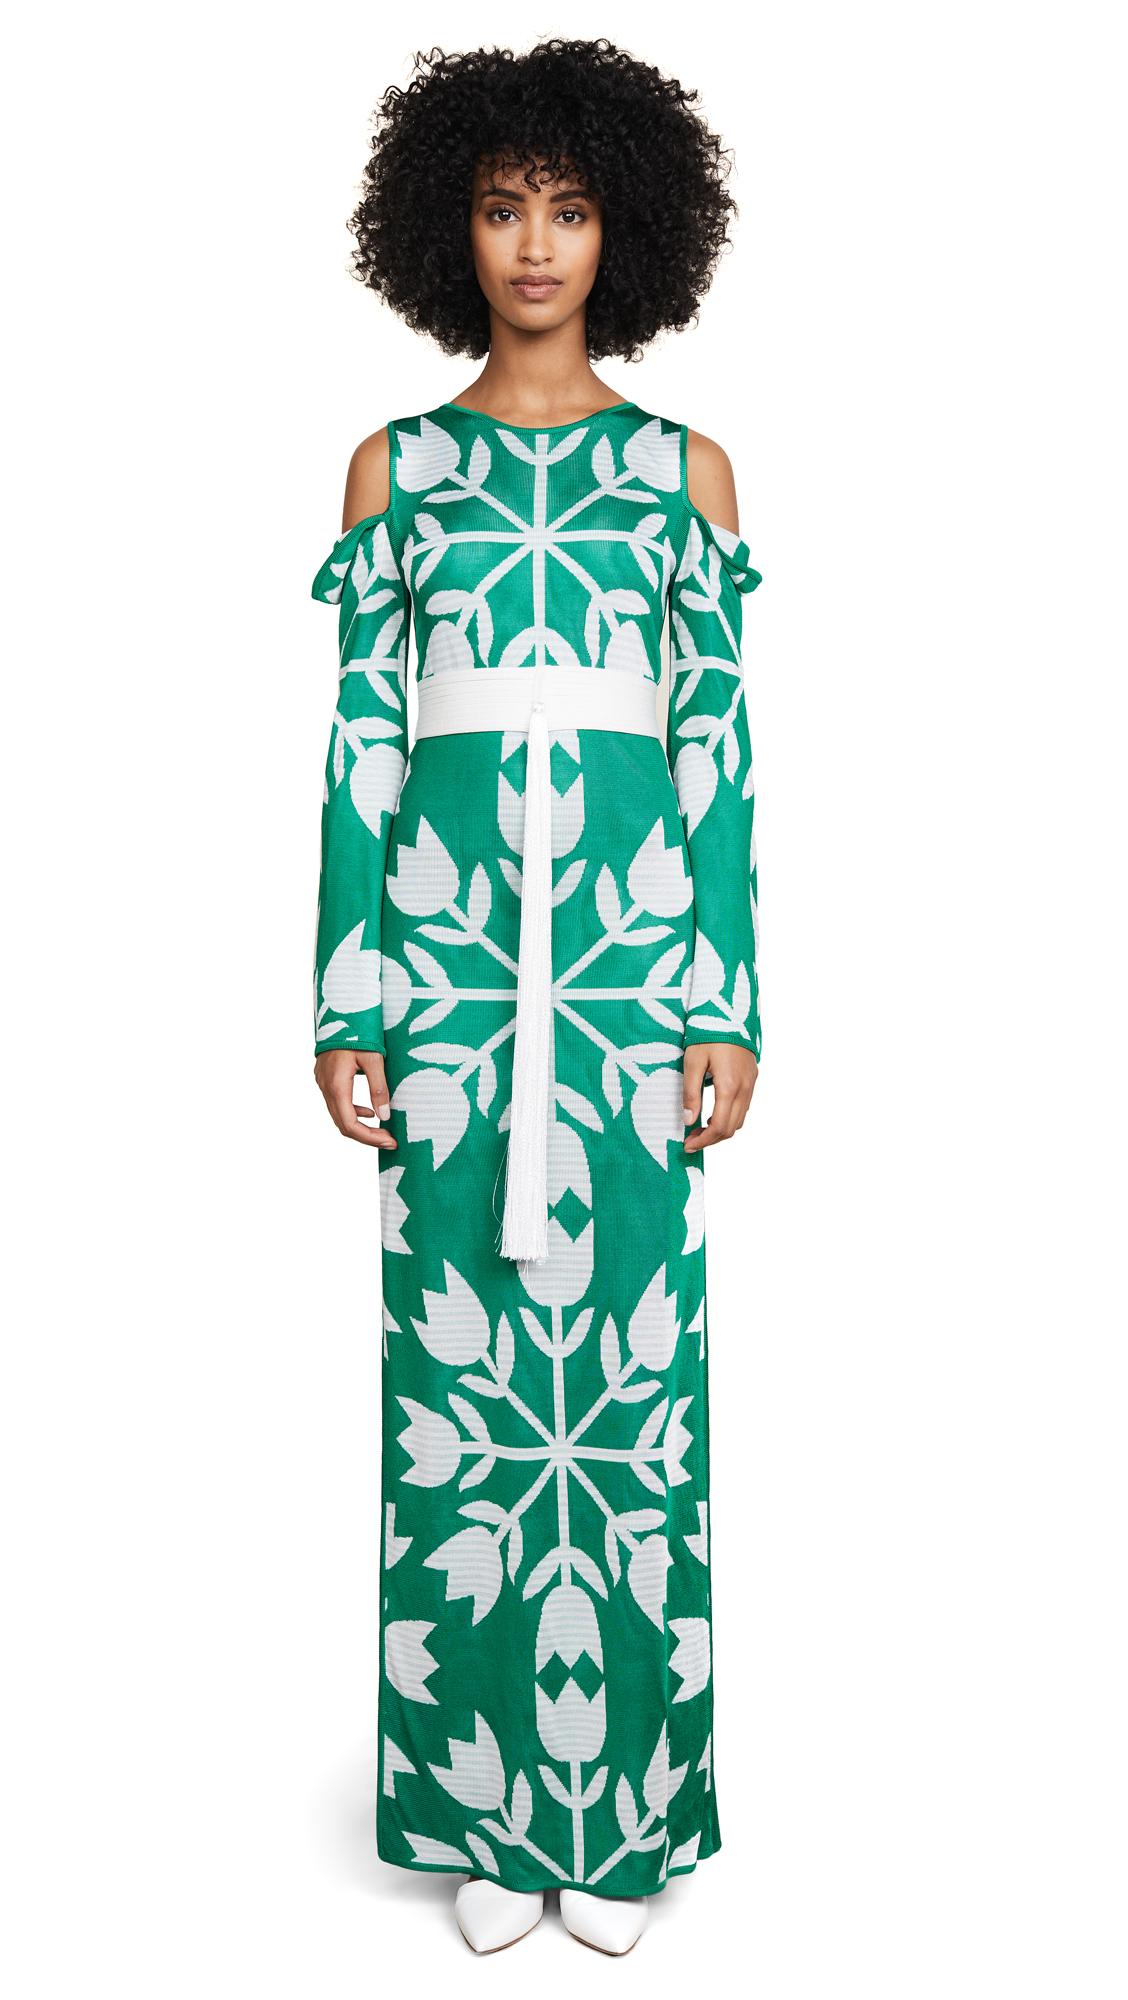 Pepa Pombo Okayama Dress In Verde/Esmeralda/Illusion Blue